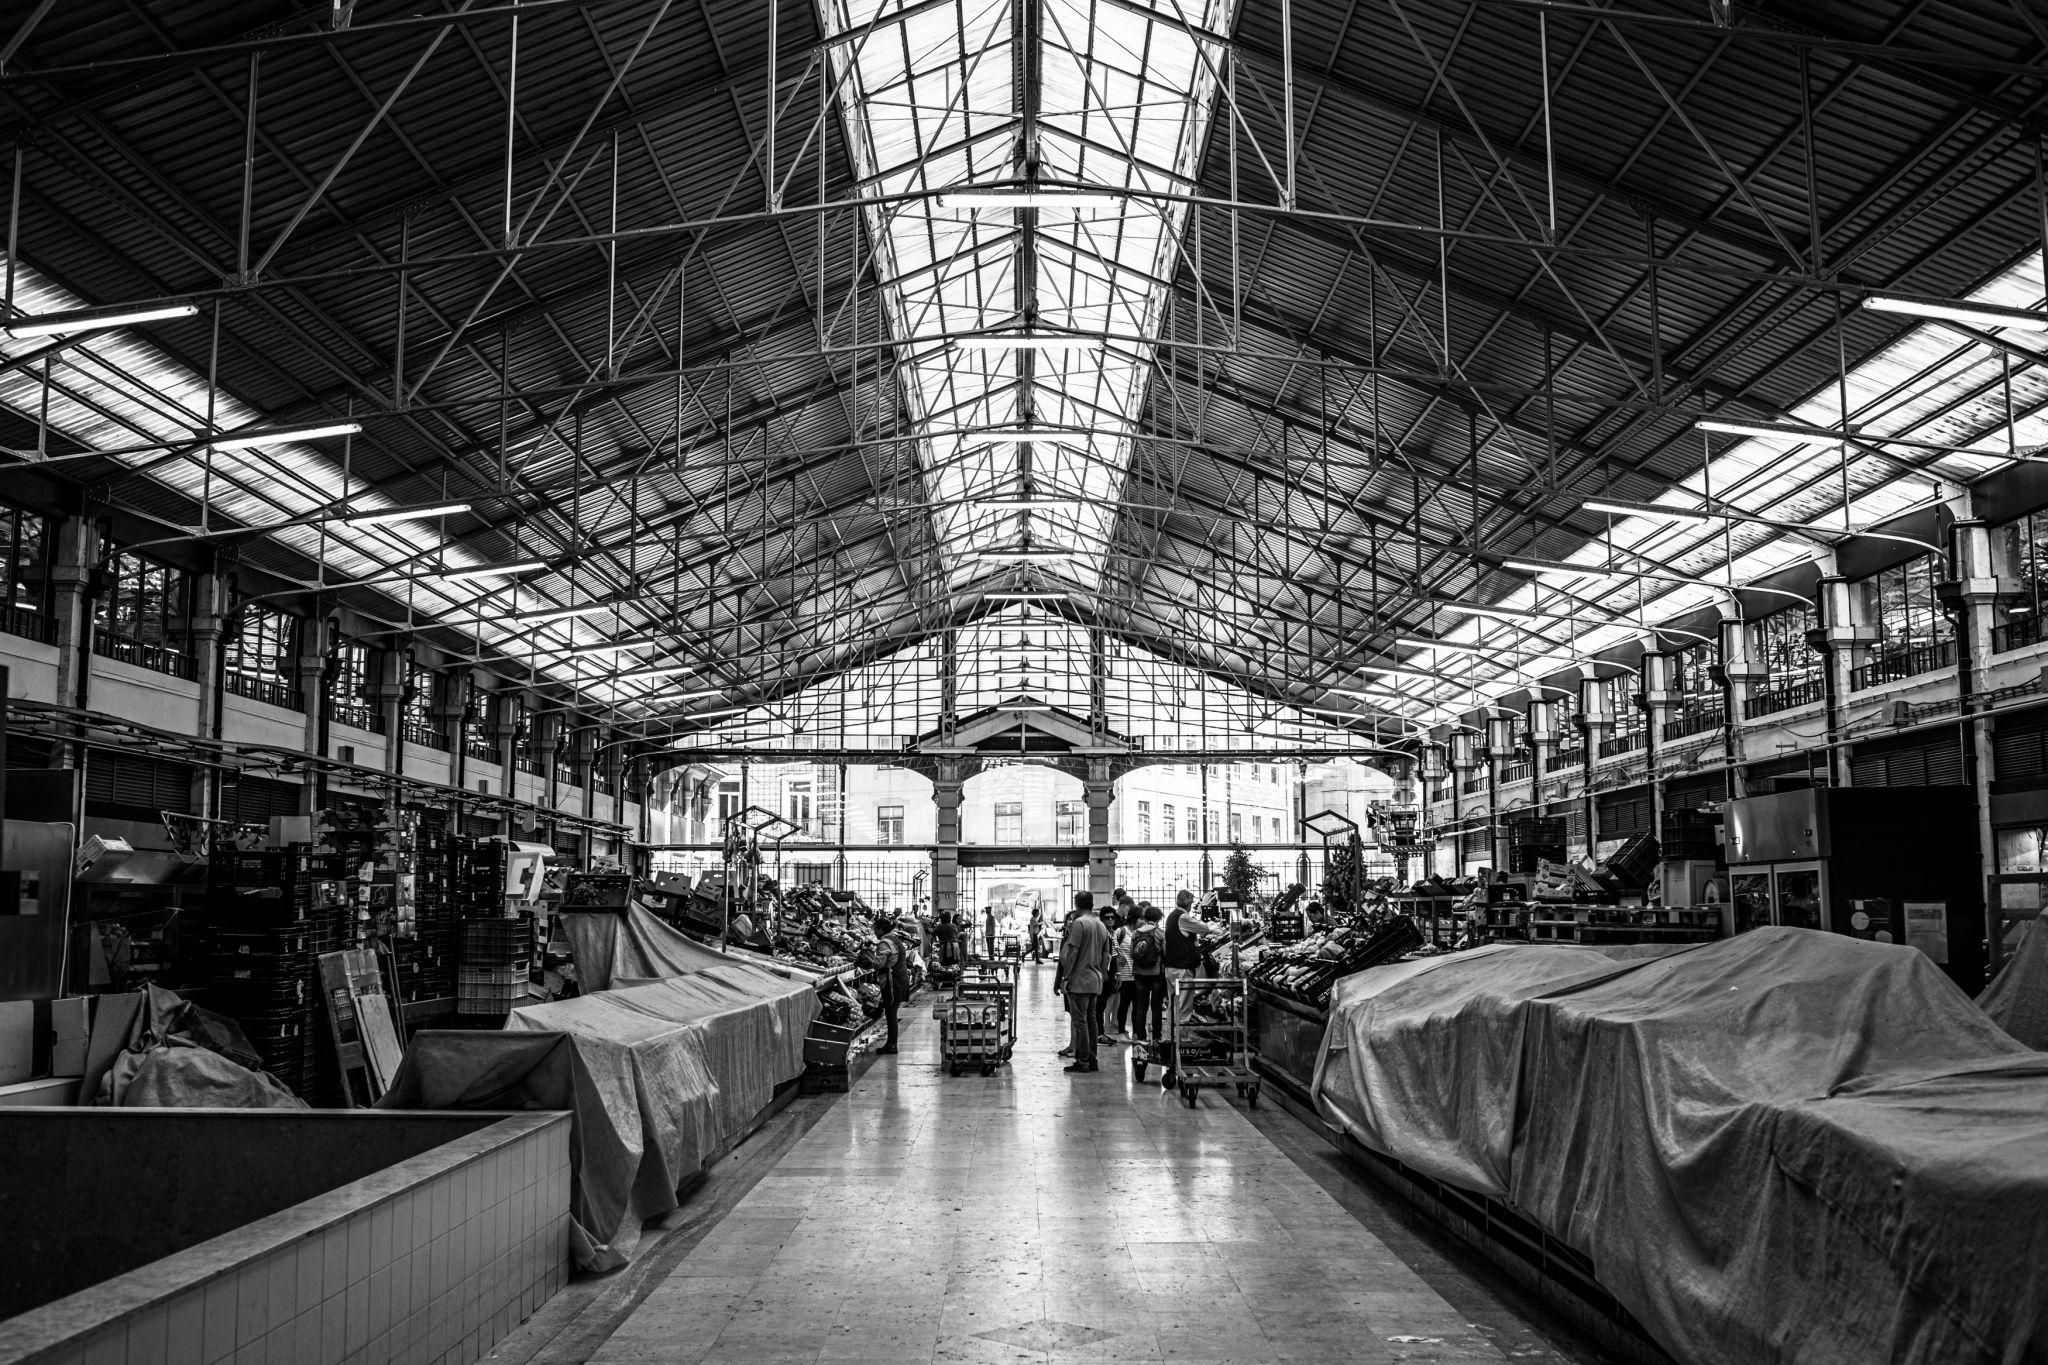 Ribeira Markt, Portugal